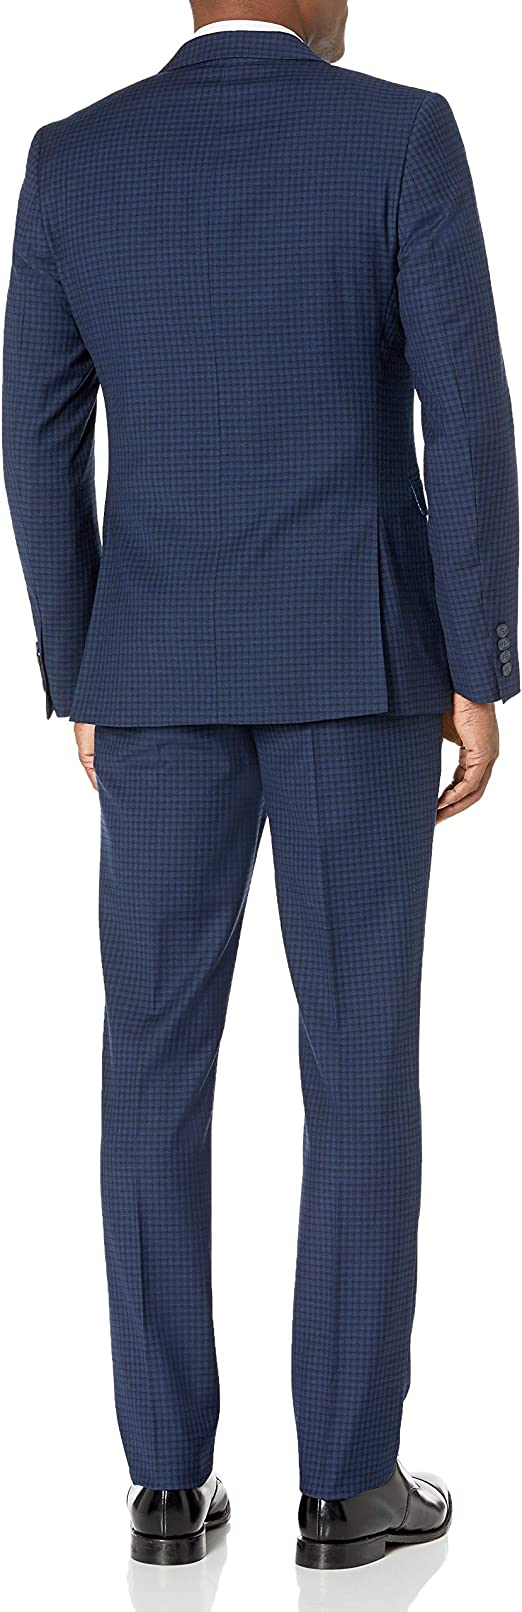 2pc Suit with Unfinished Bottom Hem Original Penguin Mens Slim Fit